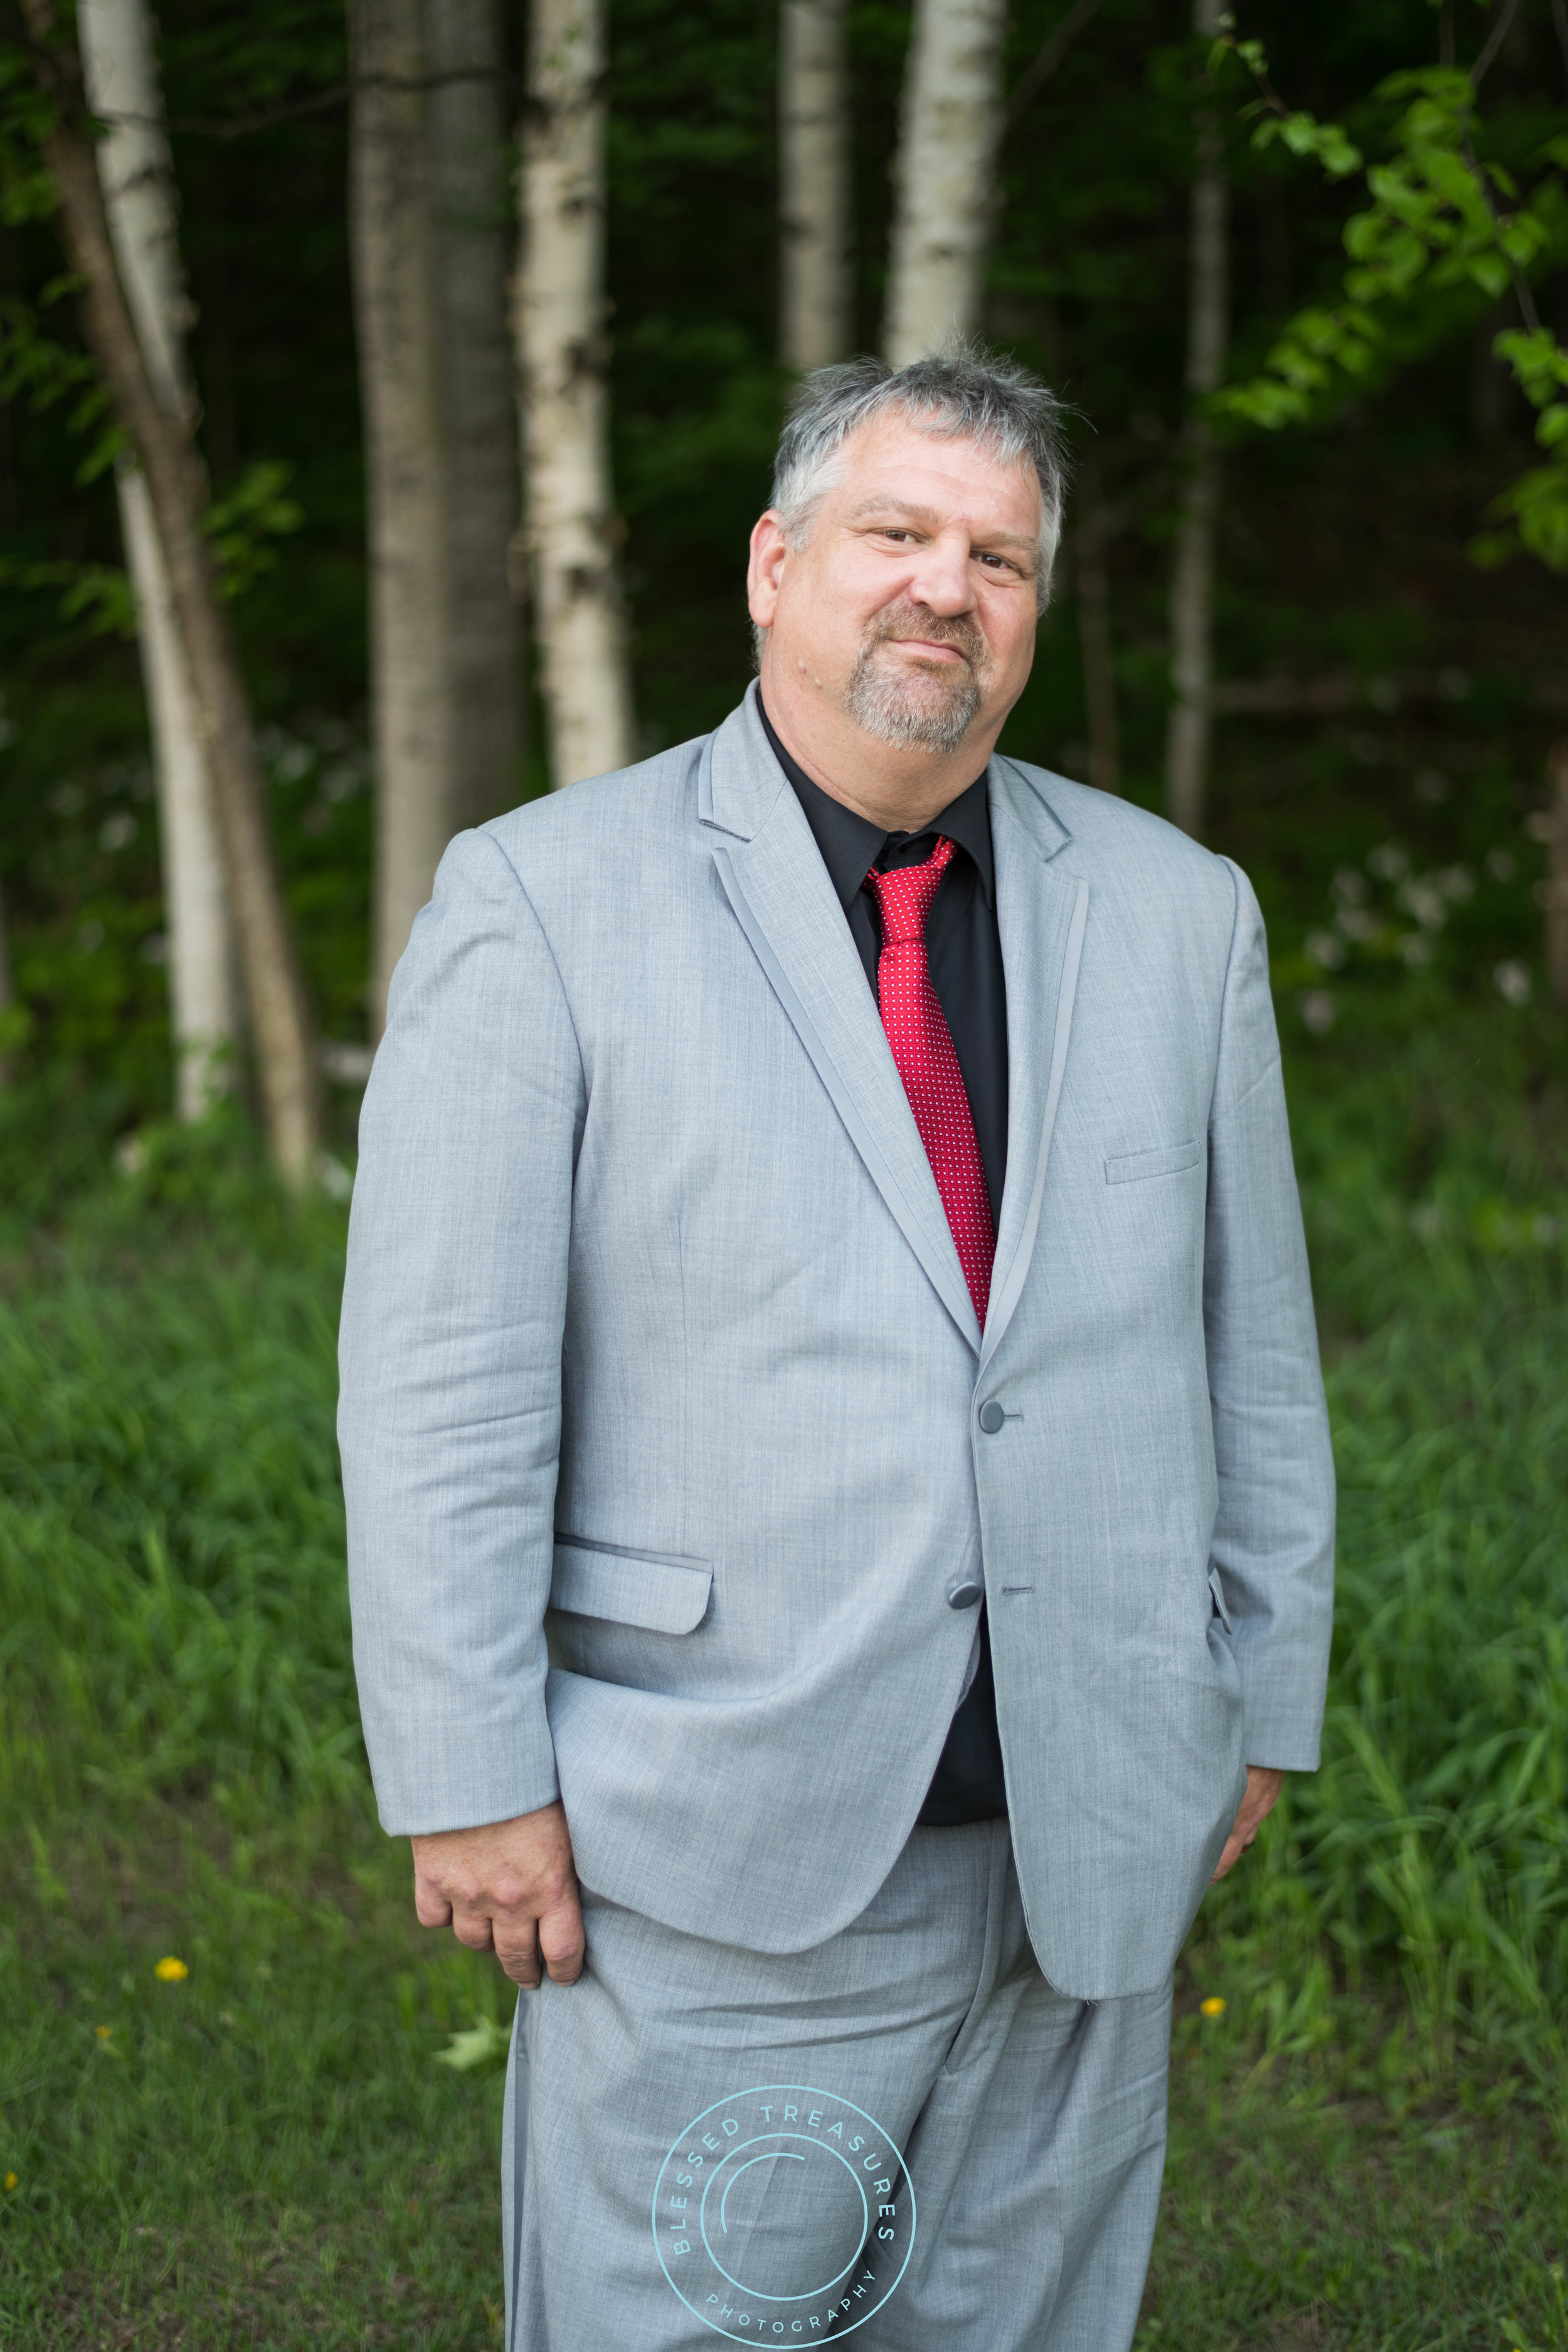 formal wedding gray suit vest red tie black shirt